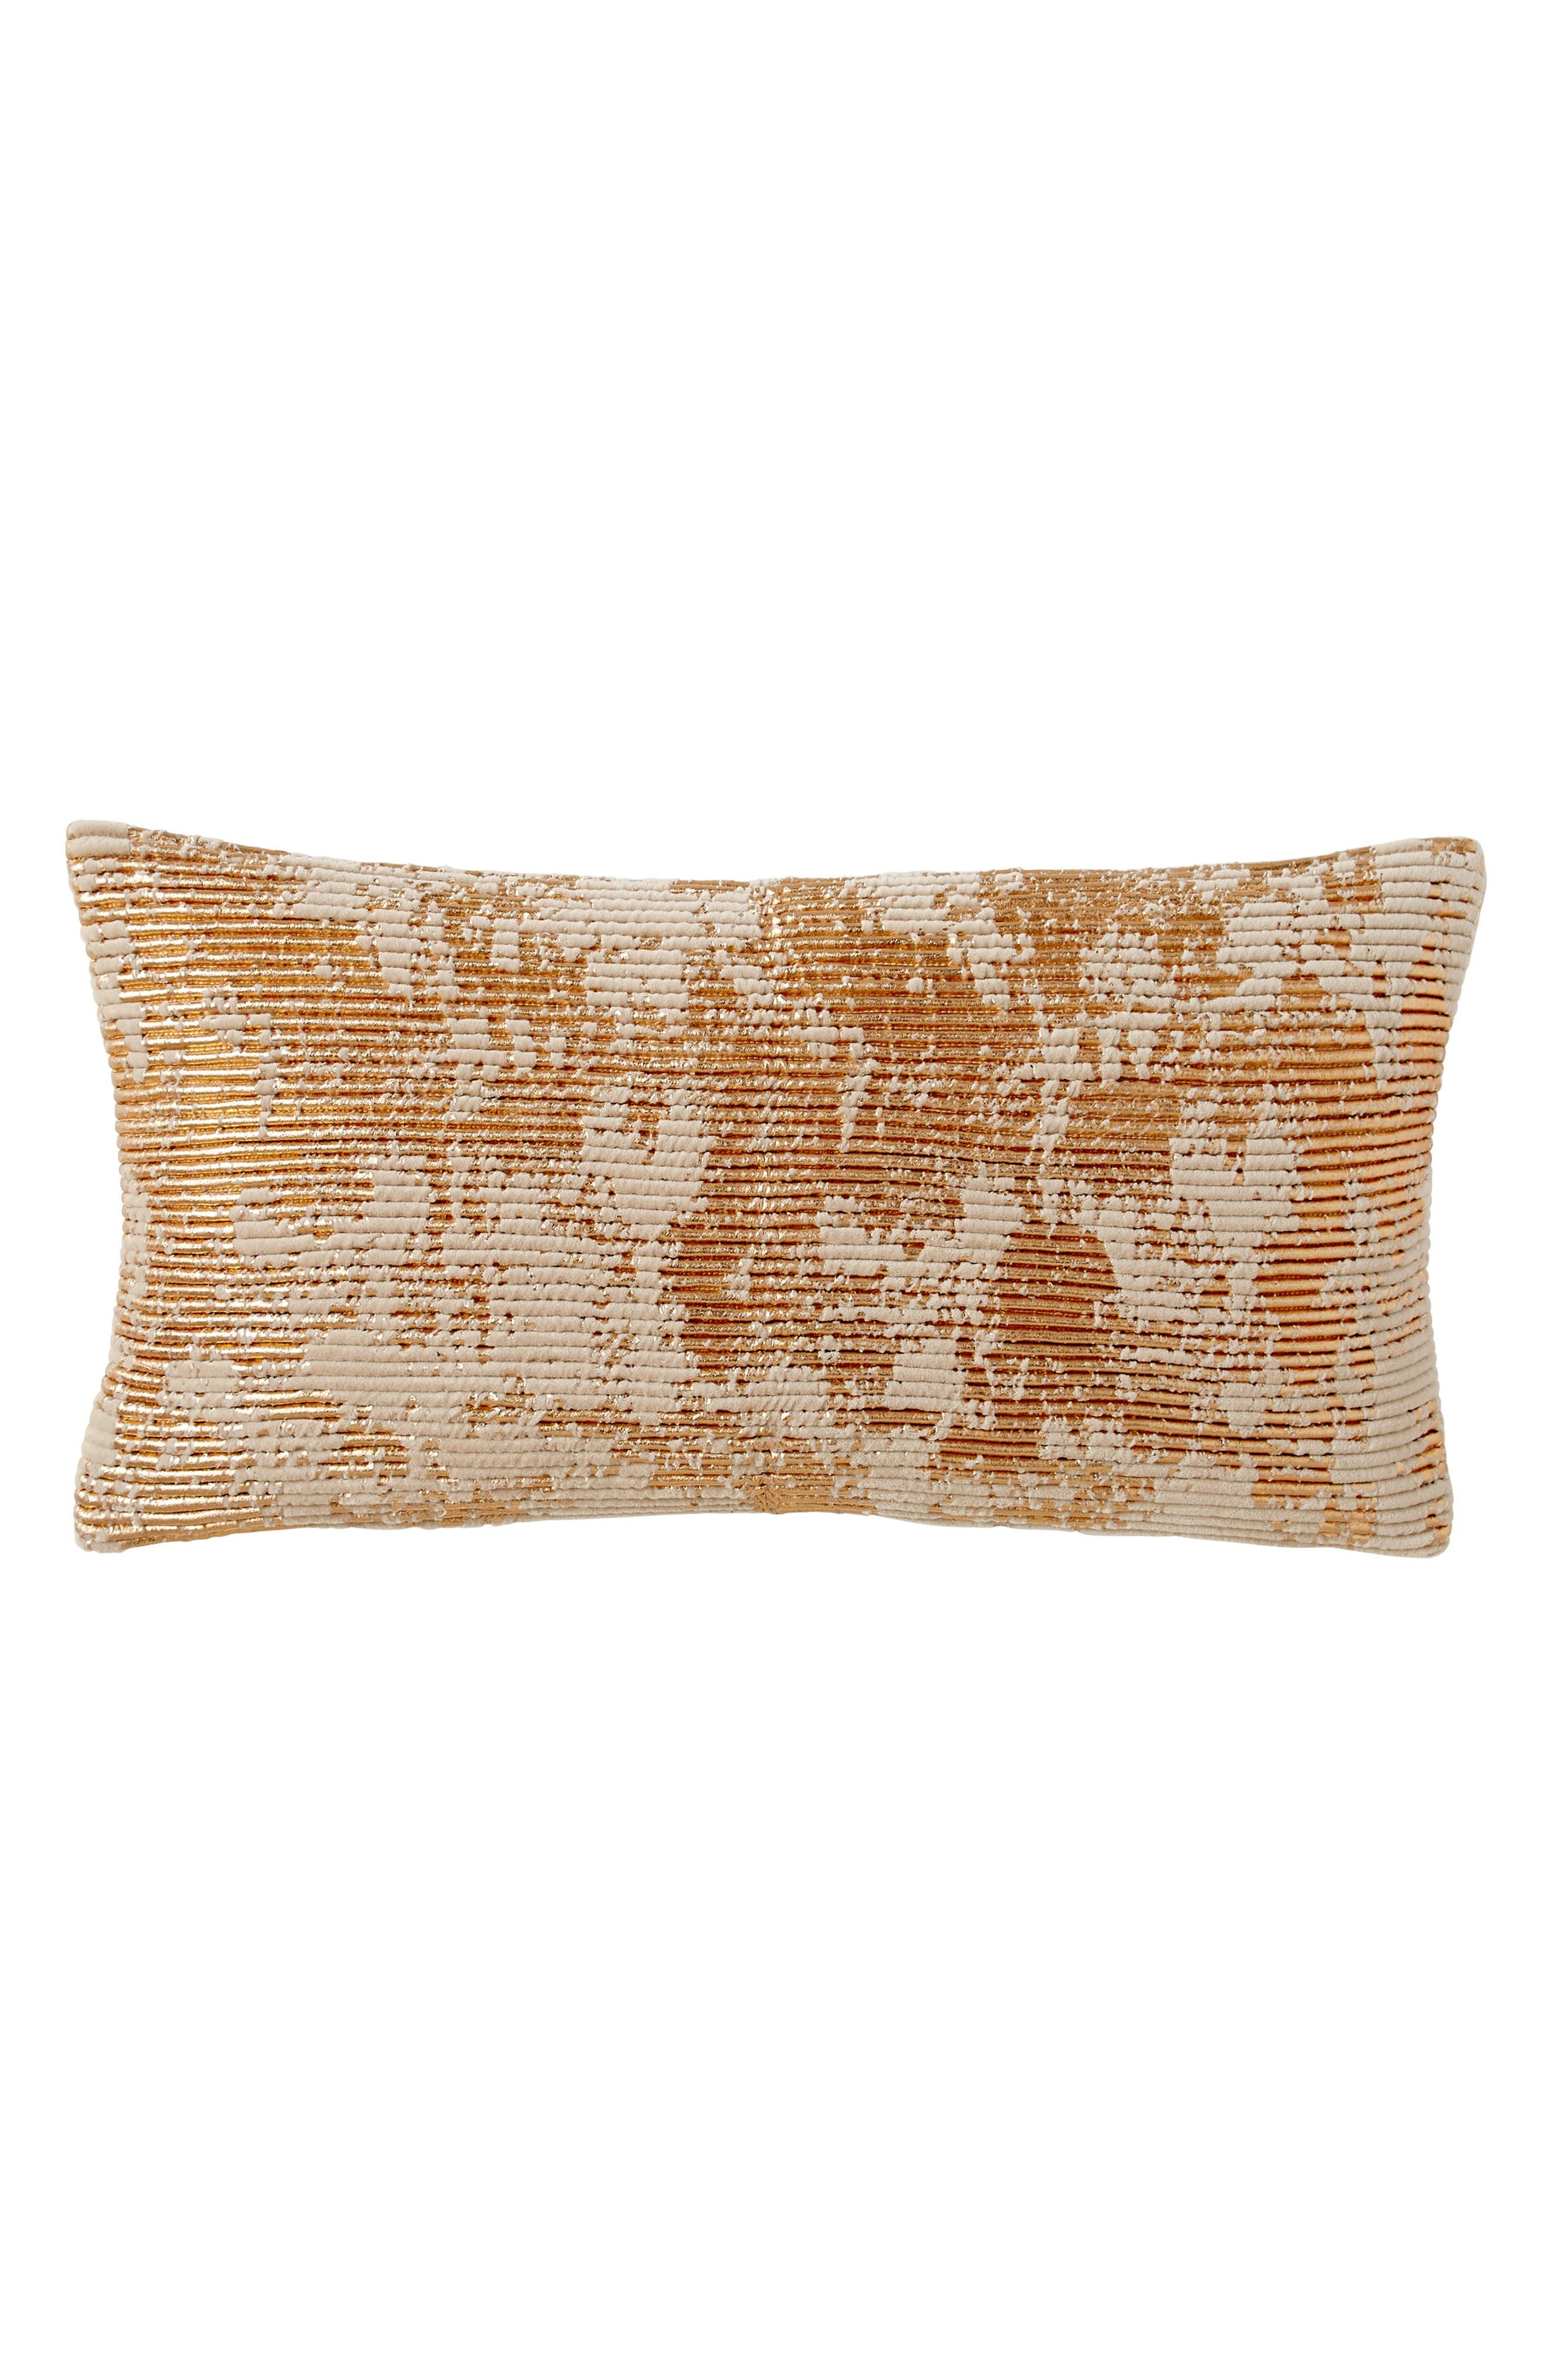 Donna Karan Homoe Collection Awakening Velvet Accent Pillow,                             Main thumbnail 1, color,                             Blush